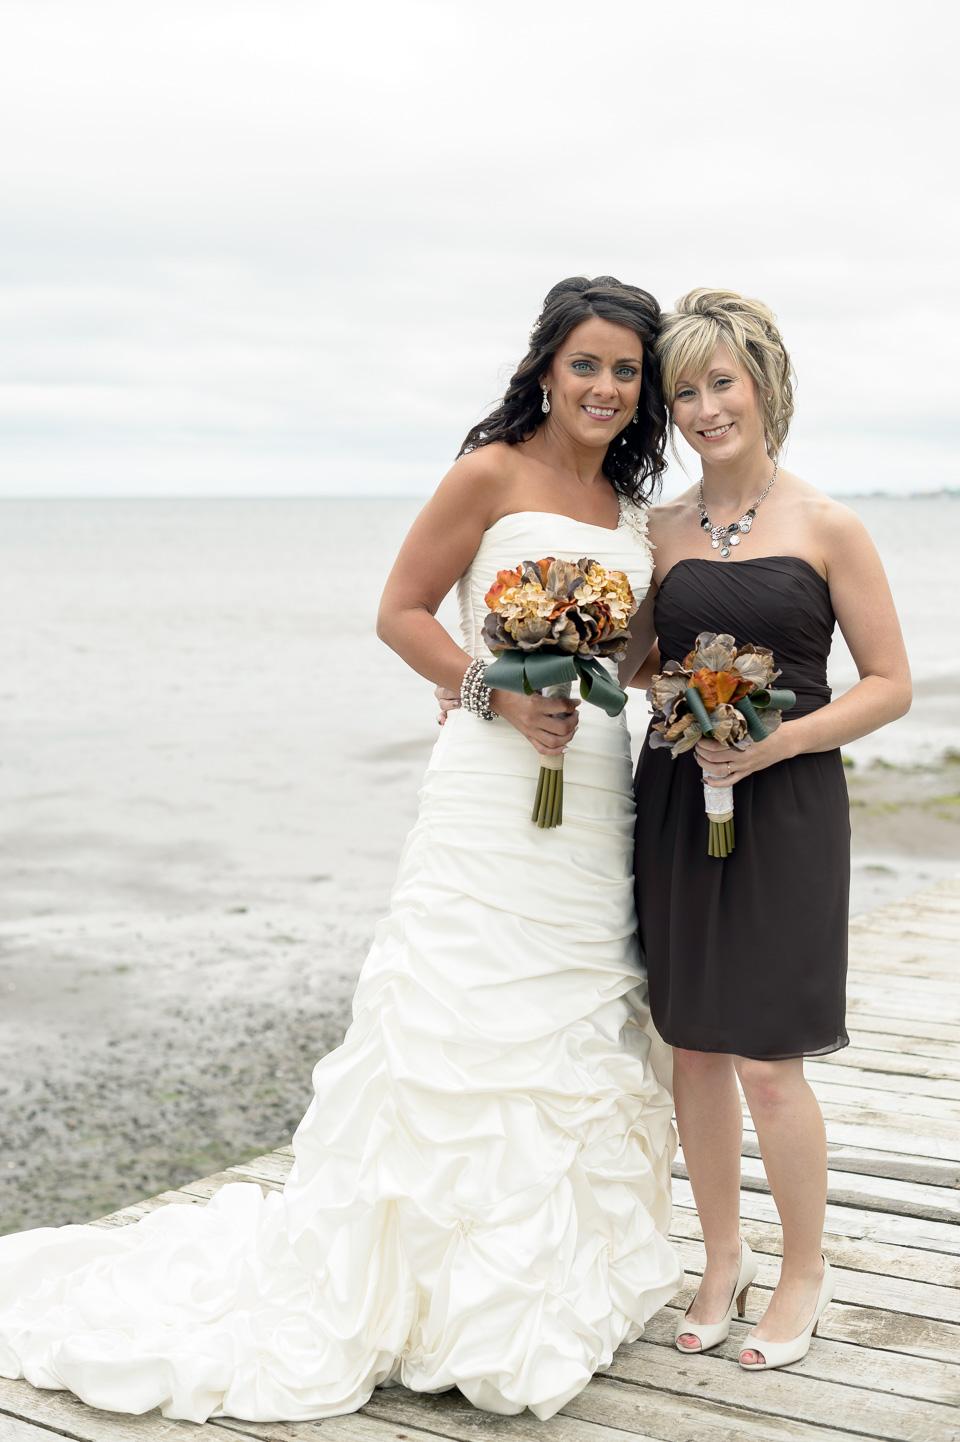 NIgel Fearon Photography | The LeBlanc Wedding-43.jpg